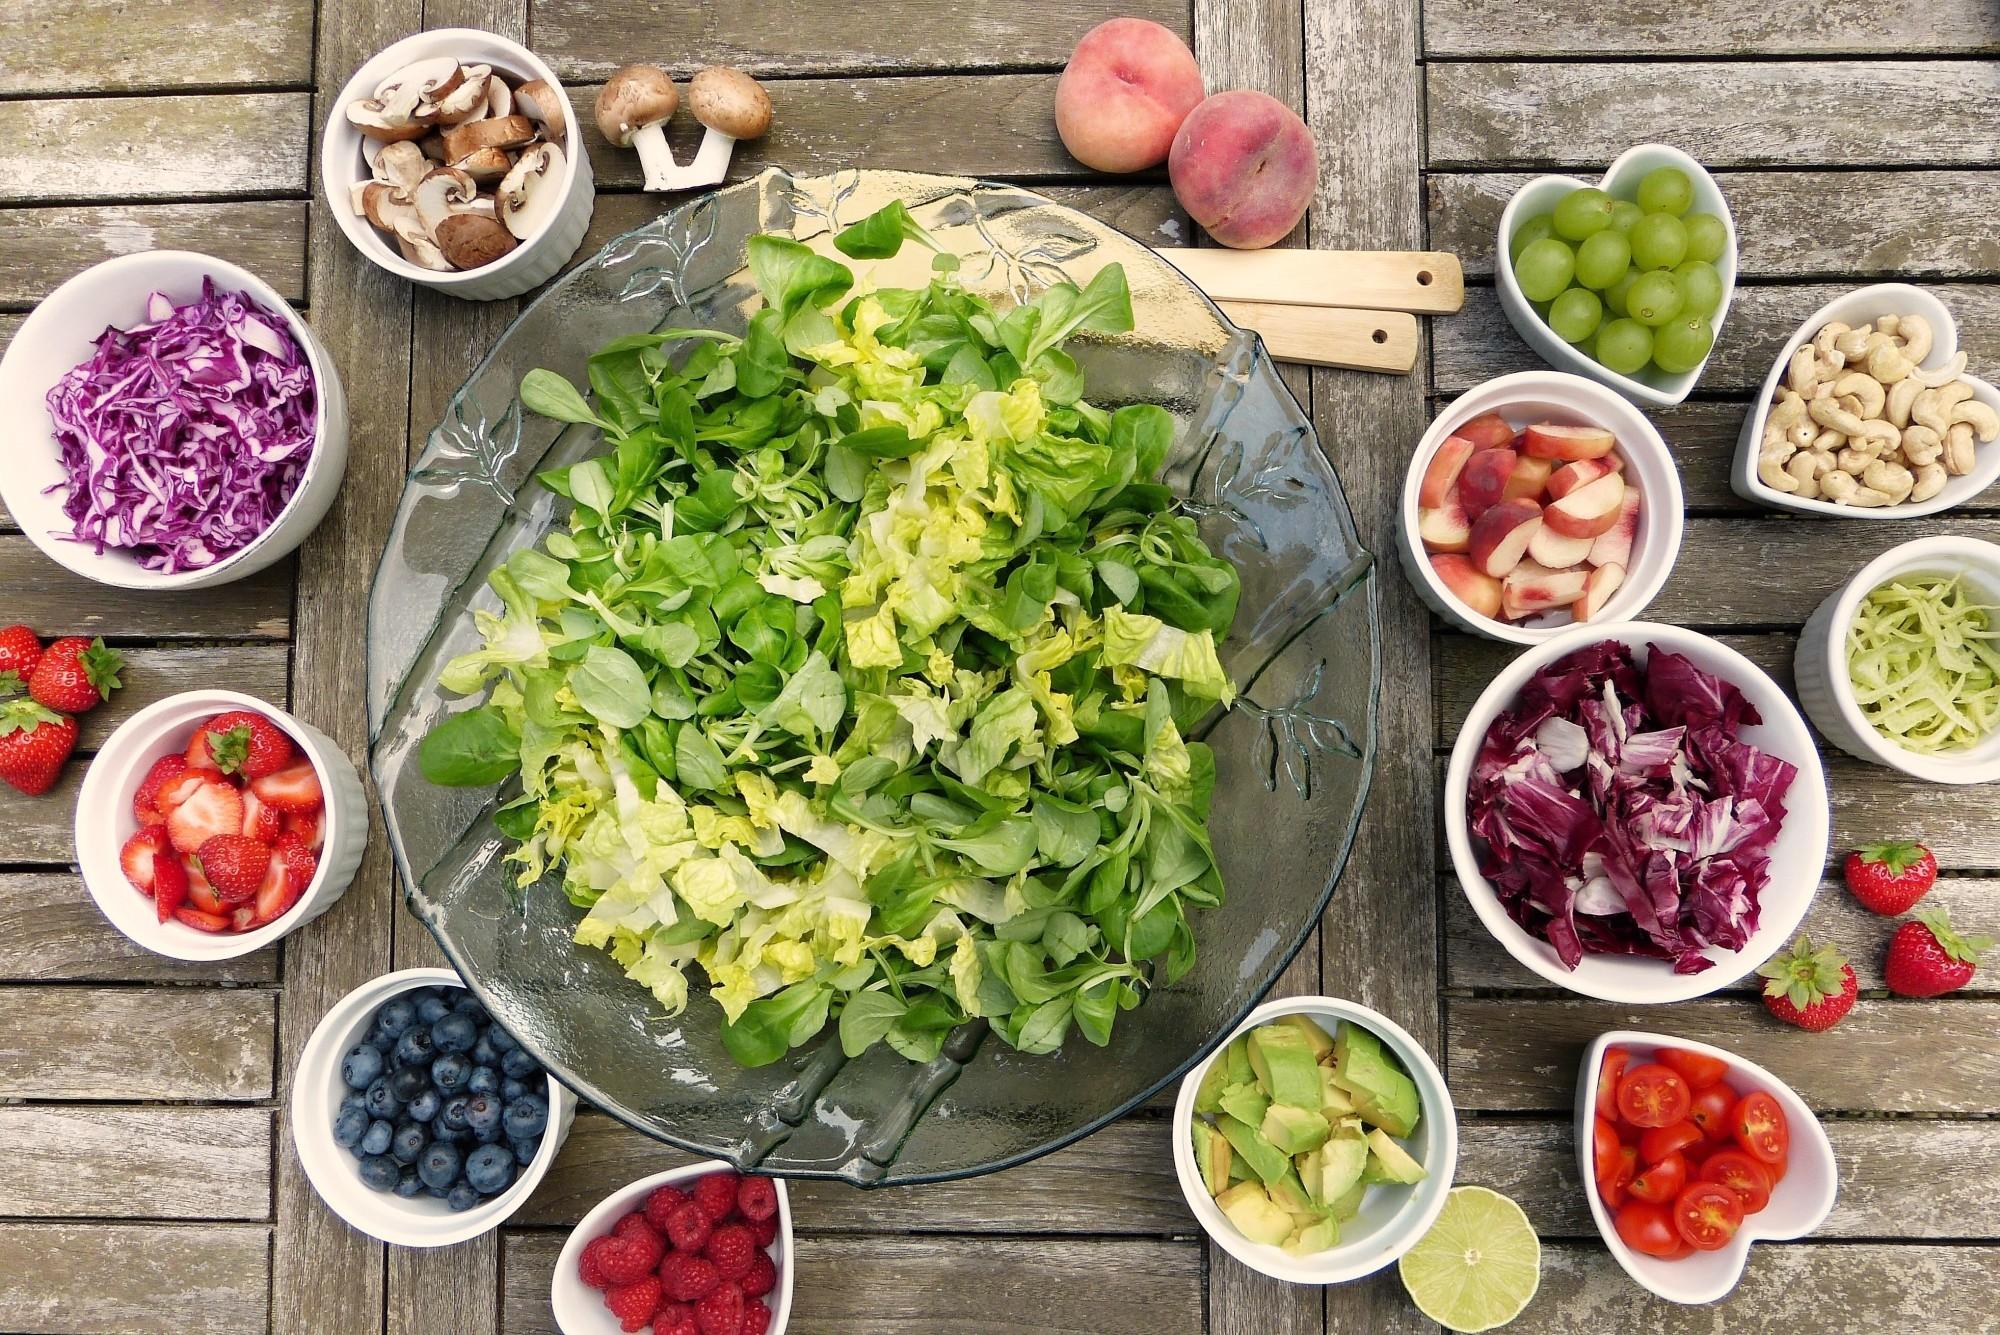 4 Fruitful Benefits of Going Vegan in 2021